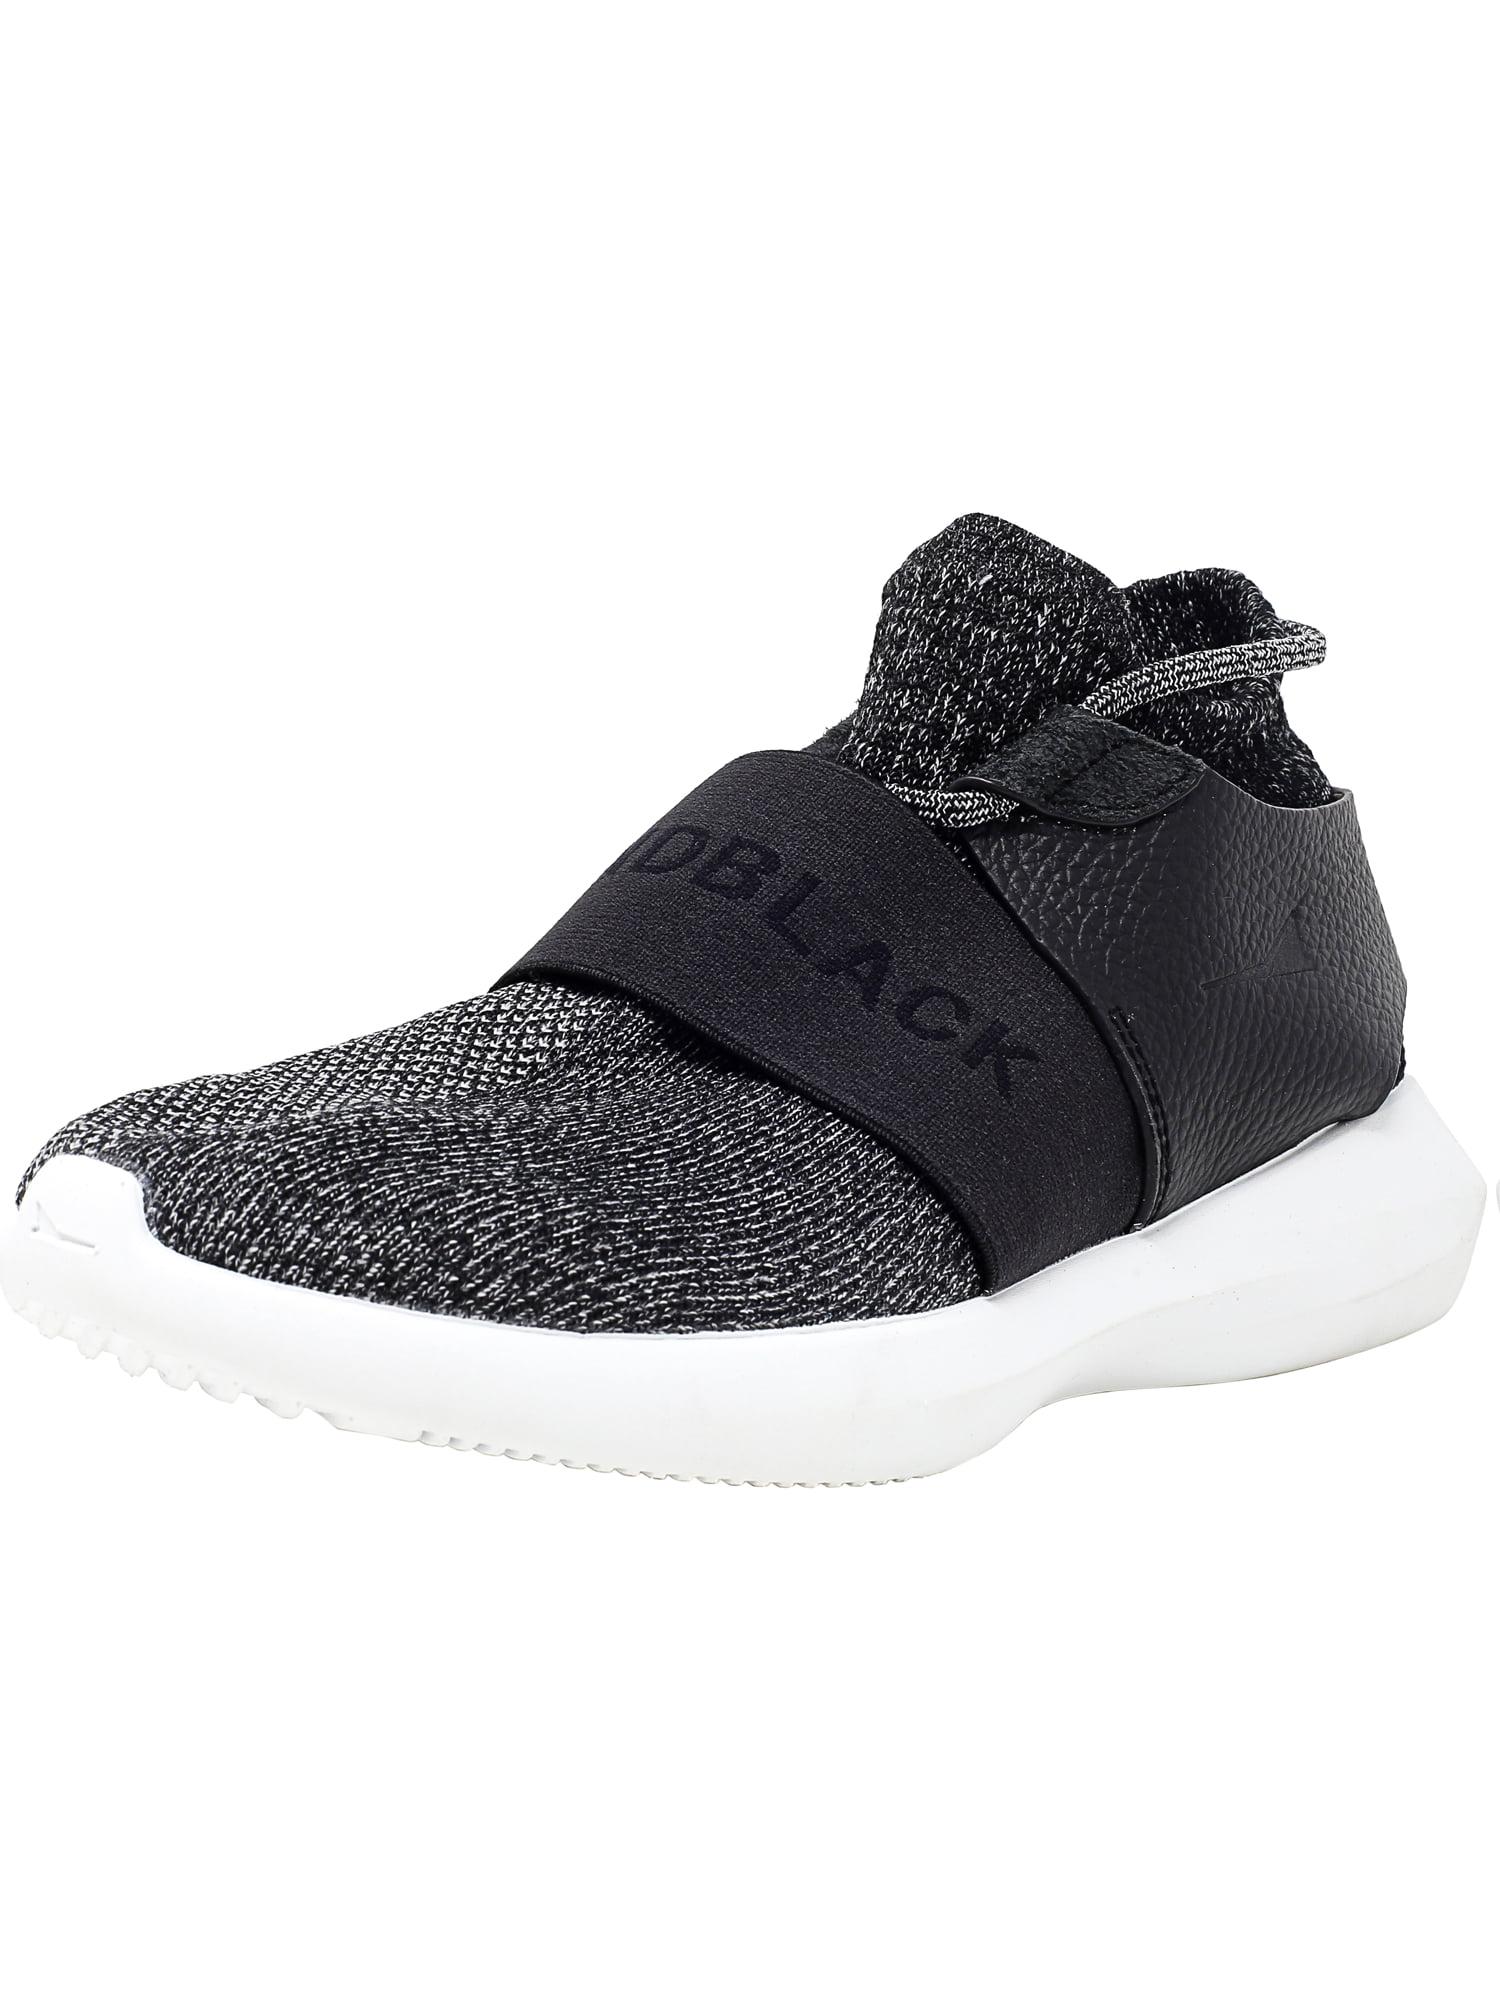 Brandblack Men's Gama Charcoal / Black Ankle-High Fabric Fashion Sneaker - 9M